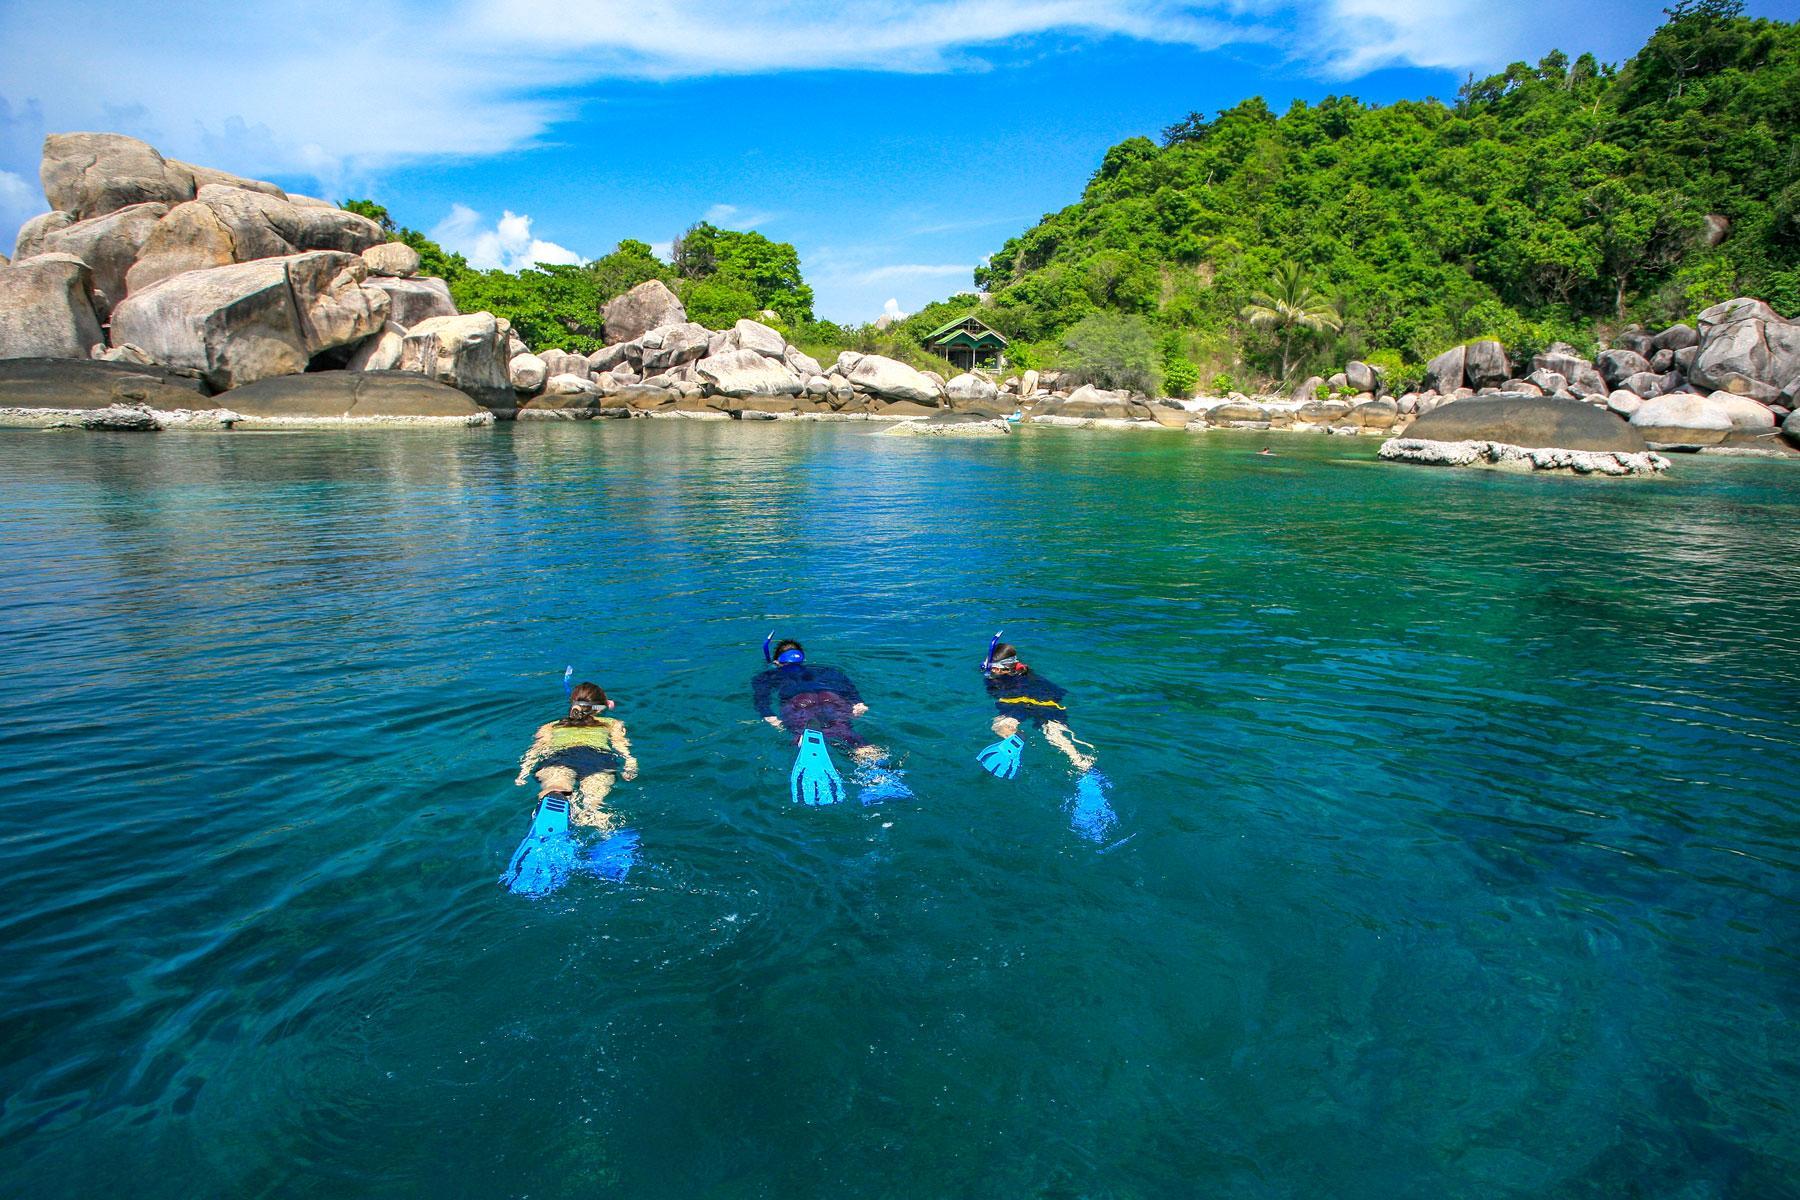 08_Thailand_Snorkeling_Diving_Koh_Tao_Shutterstock_55220665